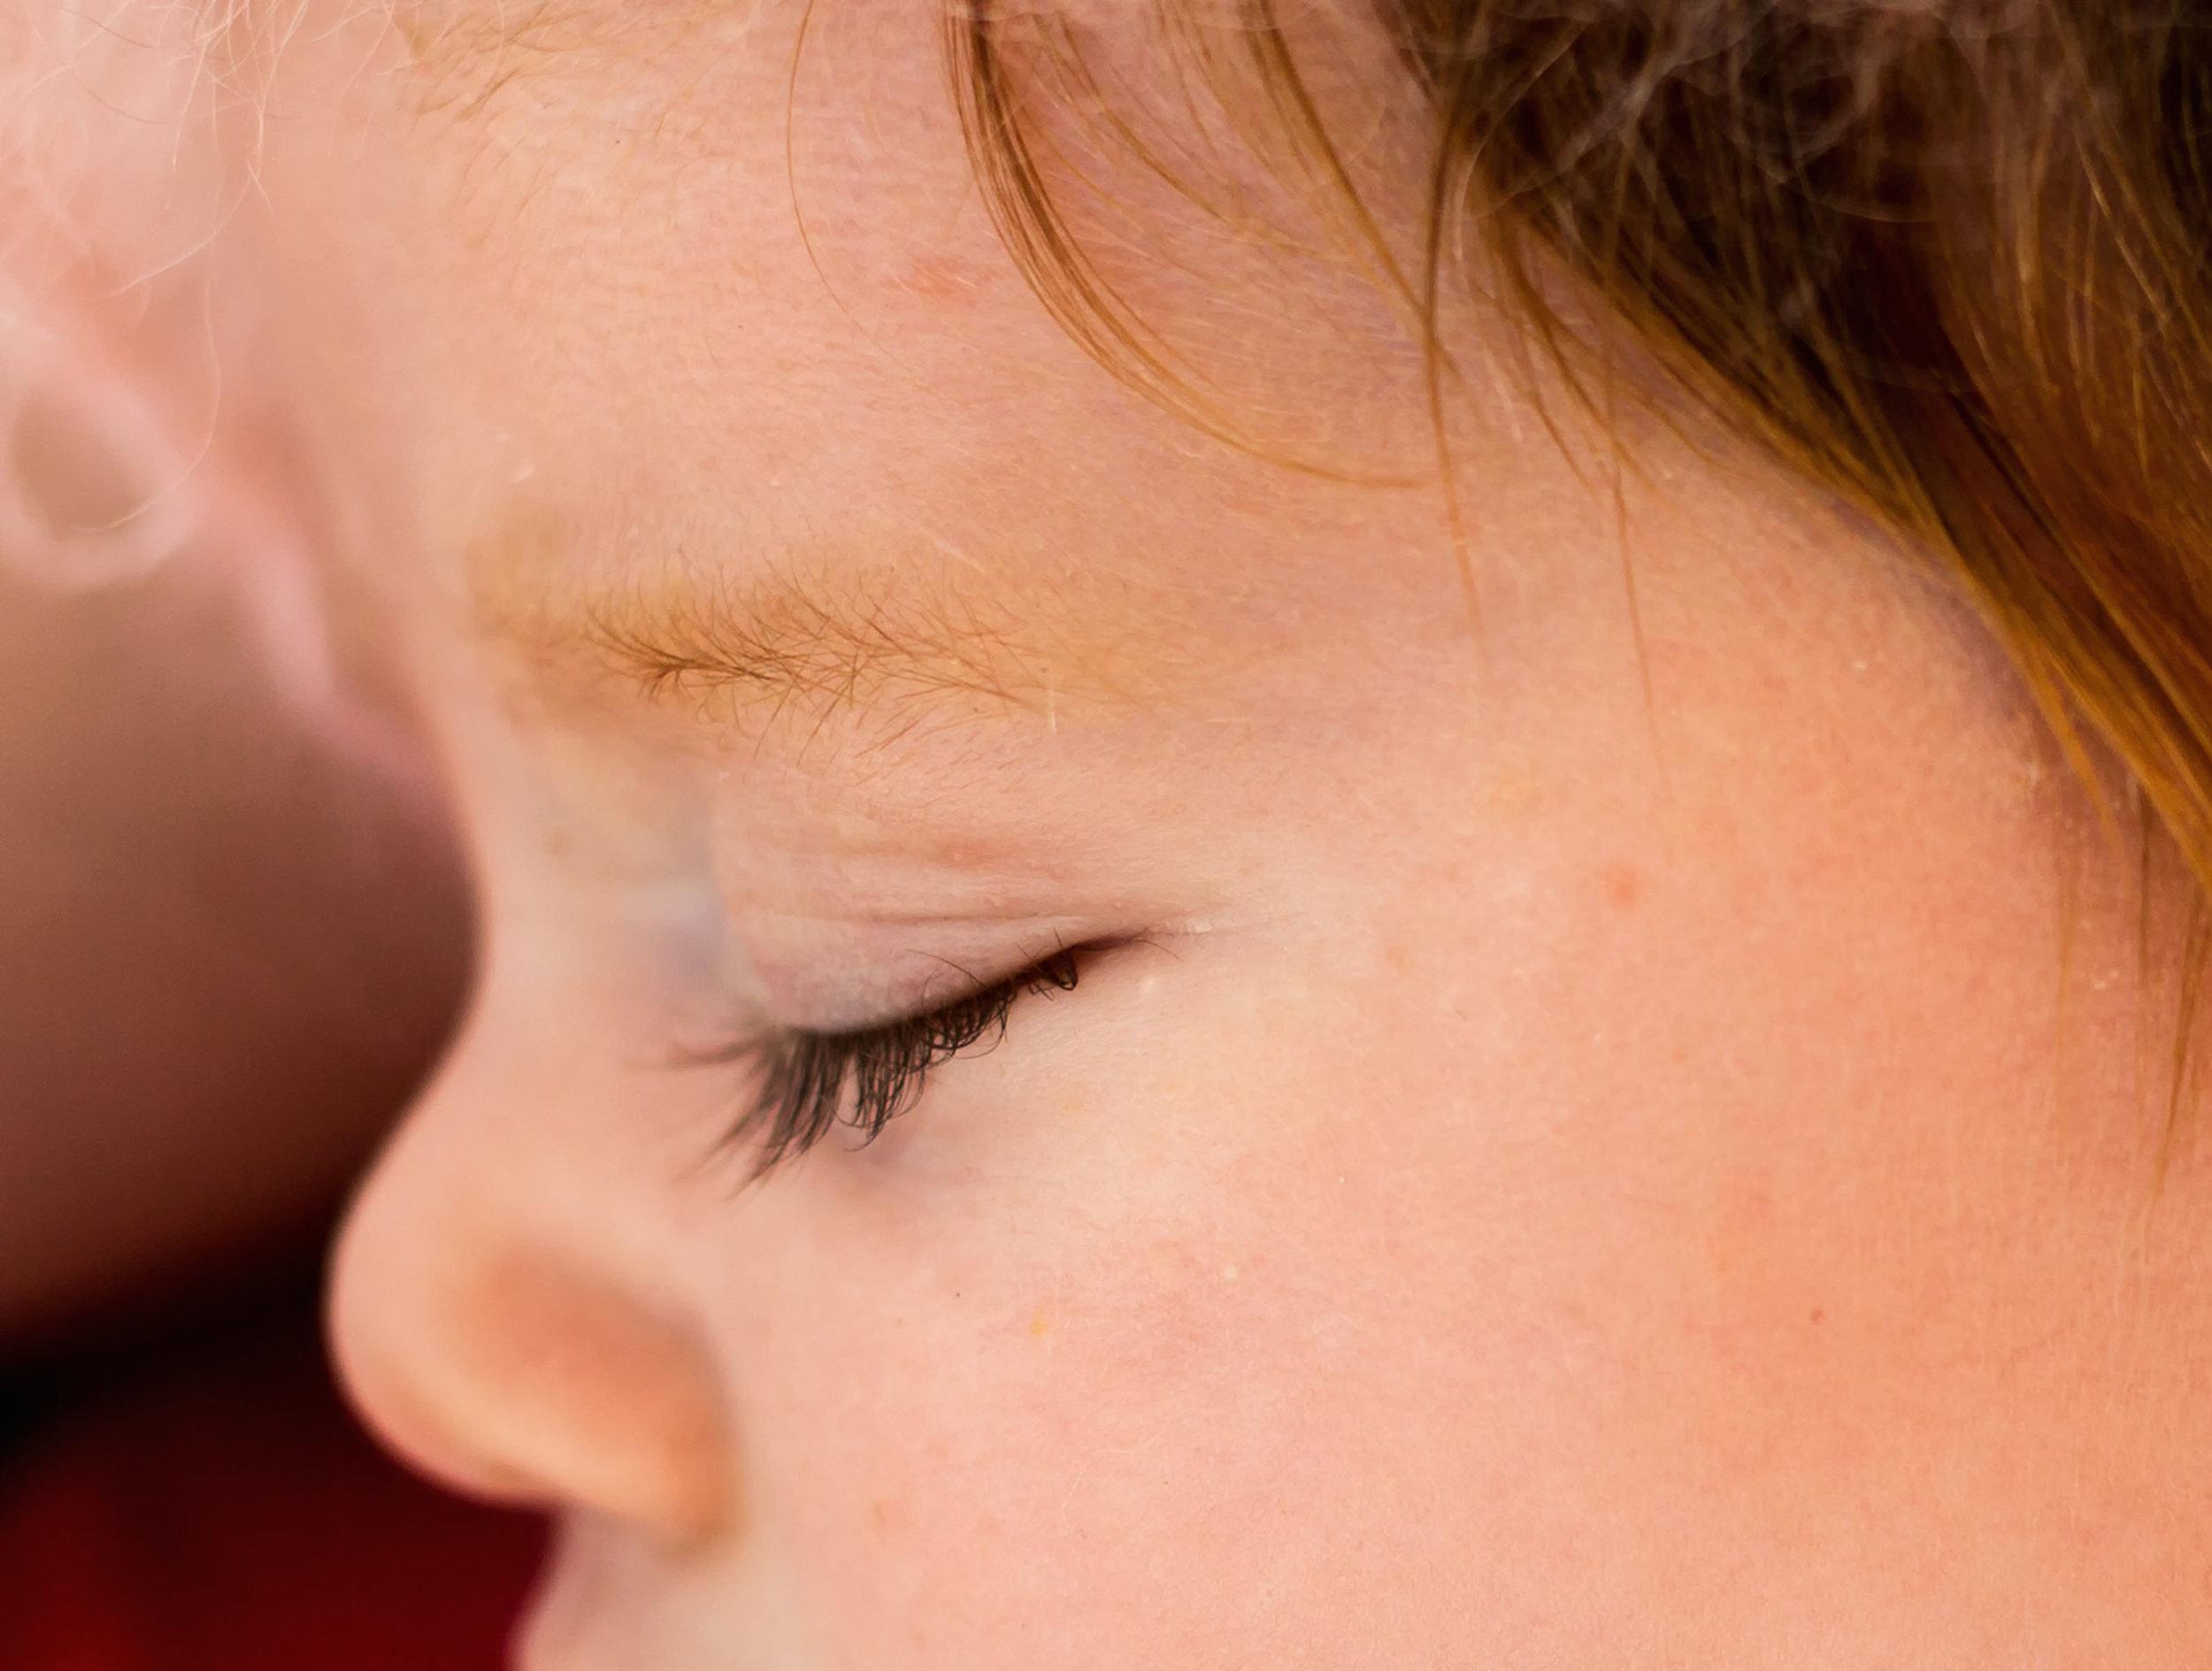 Wilmington-Newborn-Photographer-Tiffany-Abruzzo-Jordyn-20.jpg